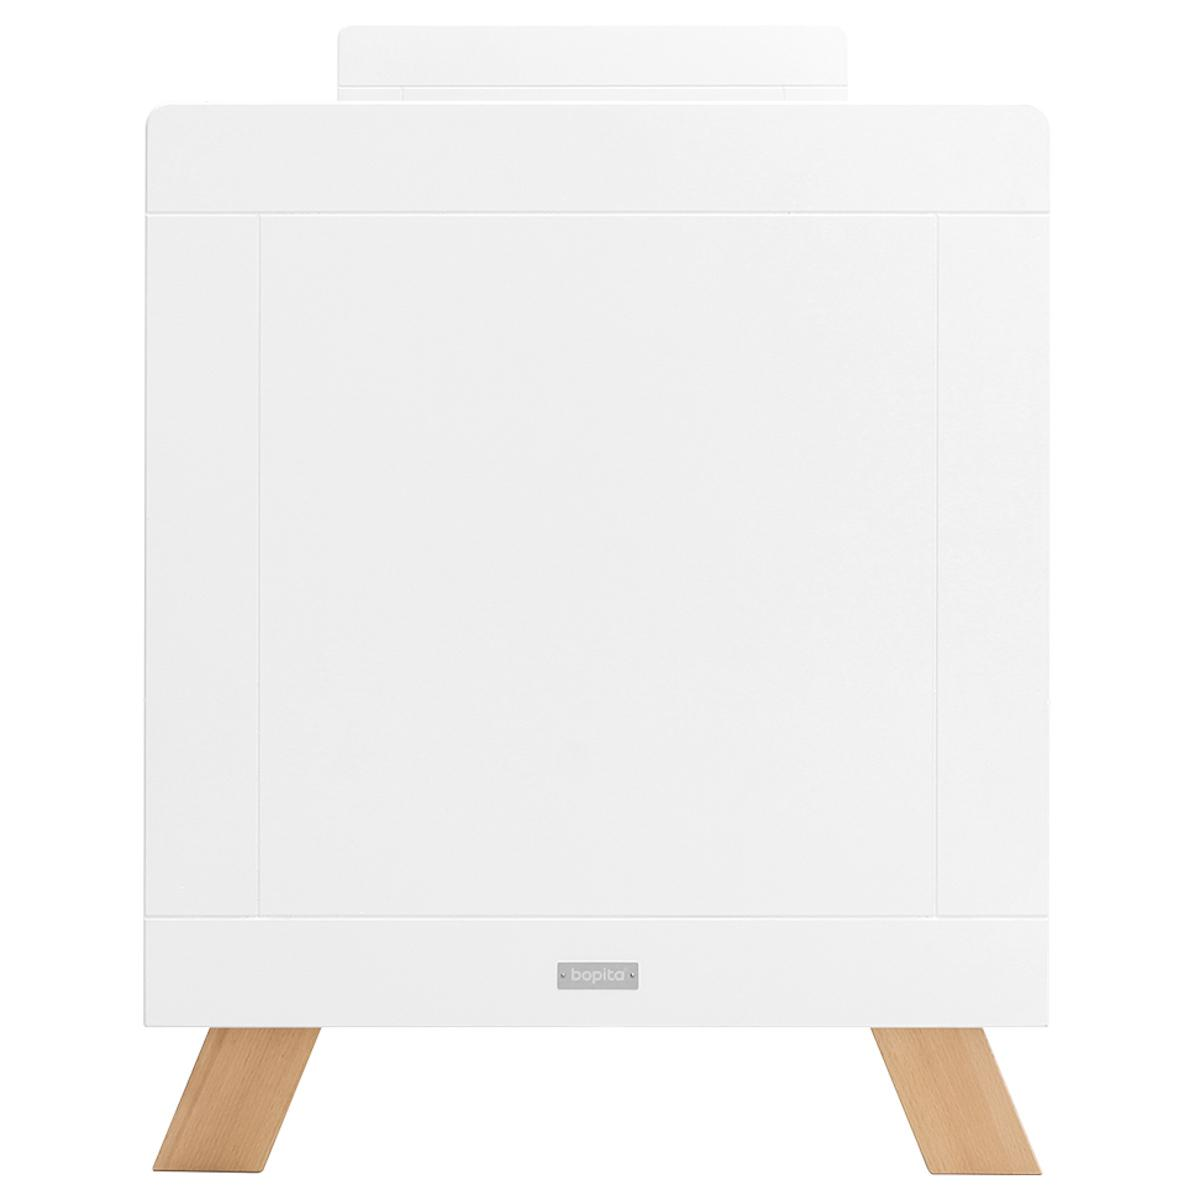 Lit bébé 60x120cm LISA Bopita blanc-naturel